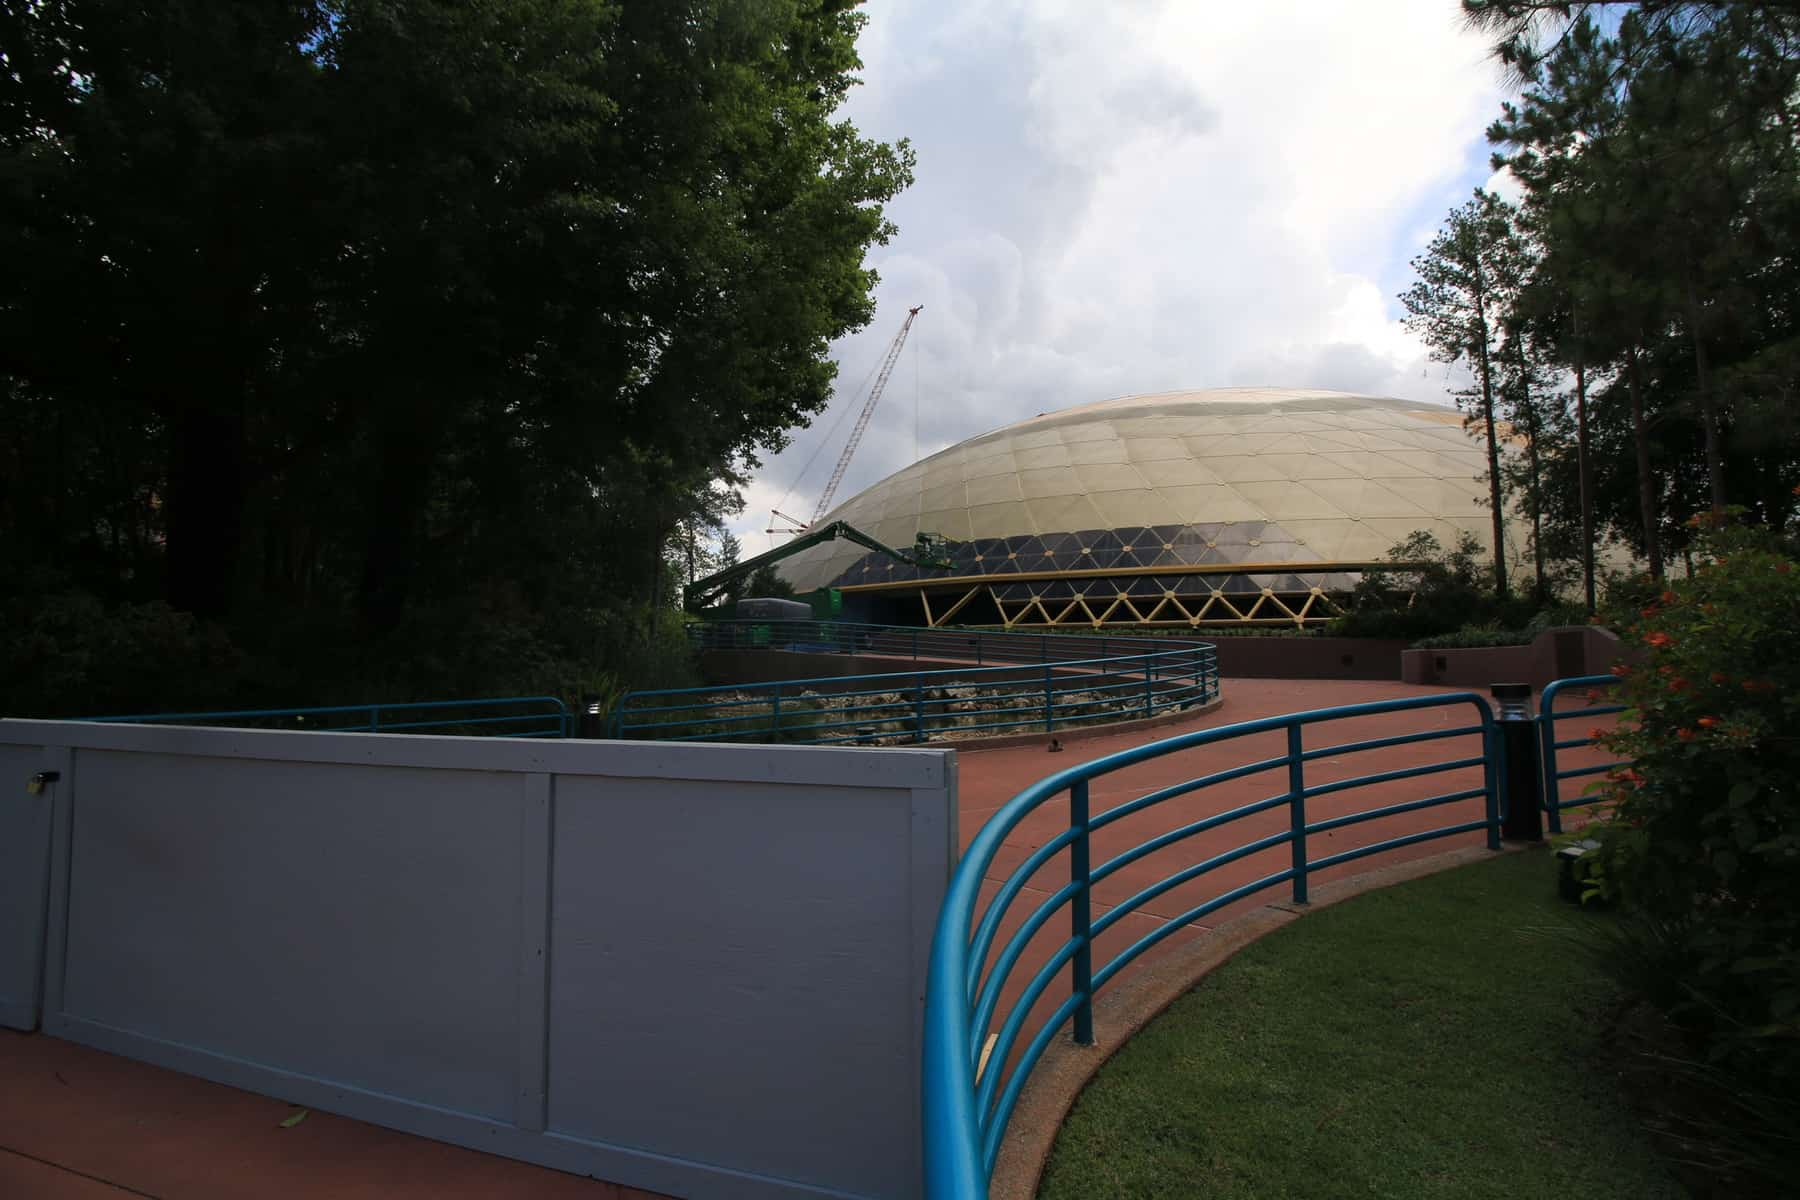 Play pavilion at Epcot